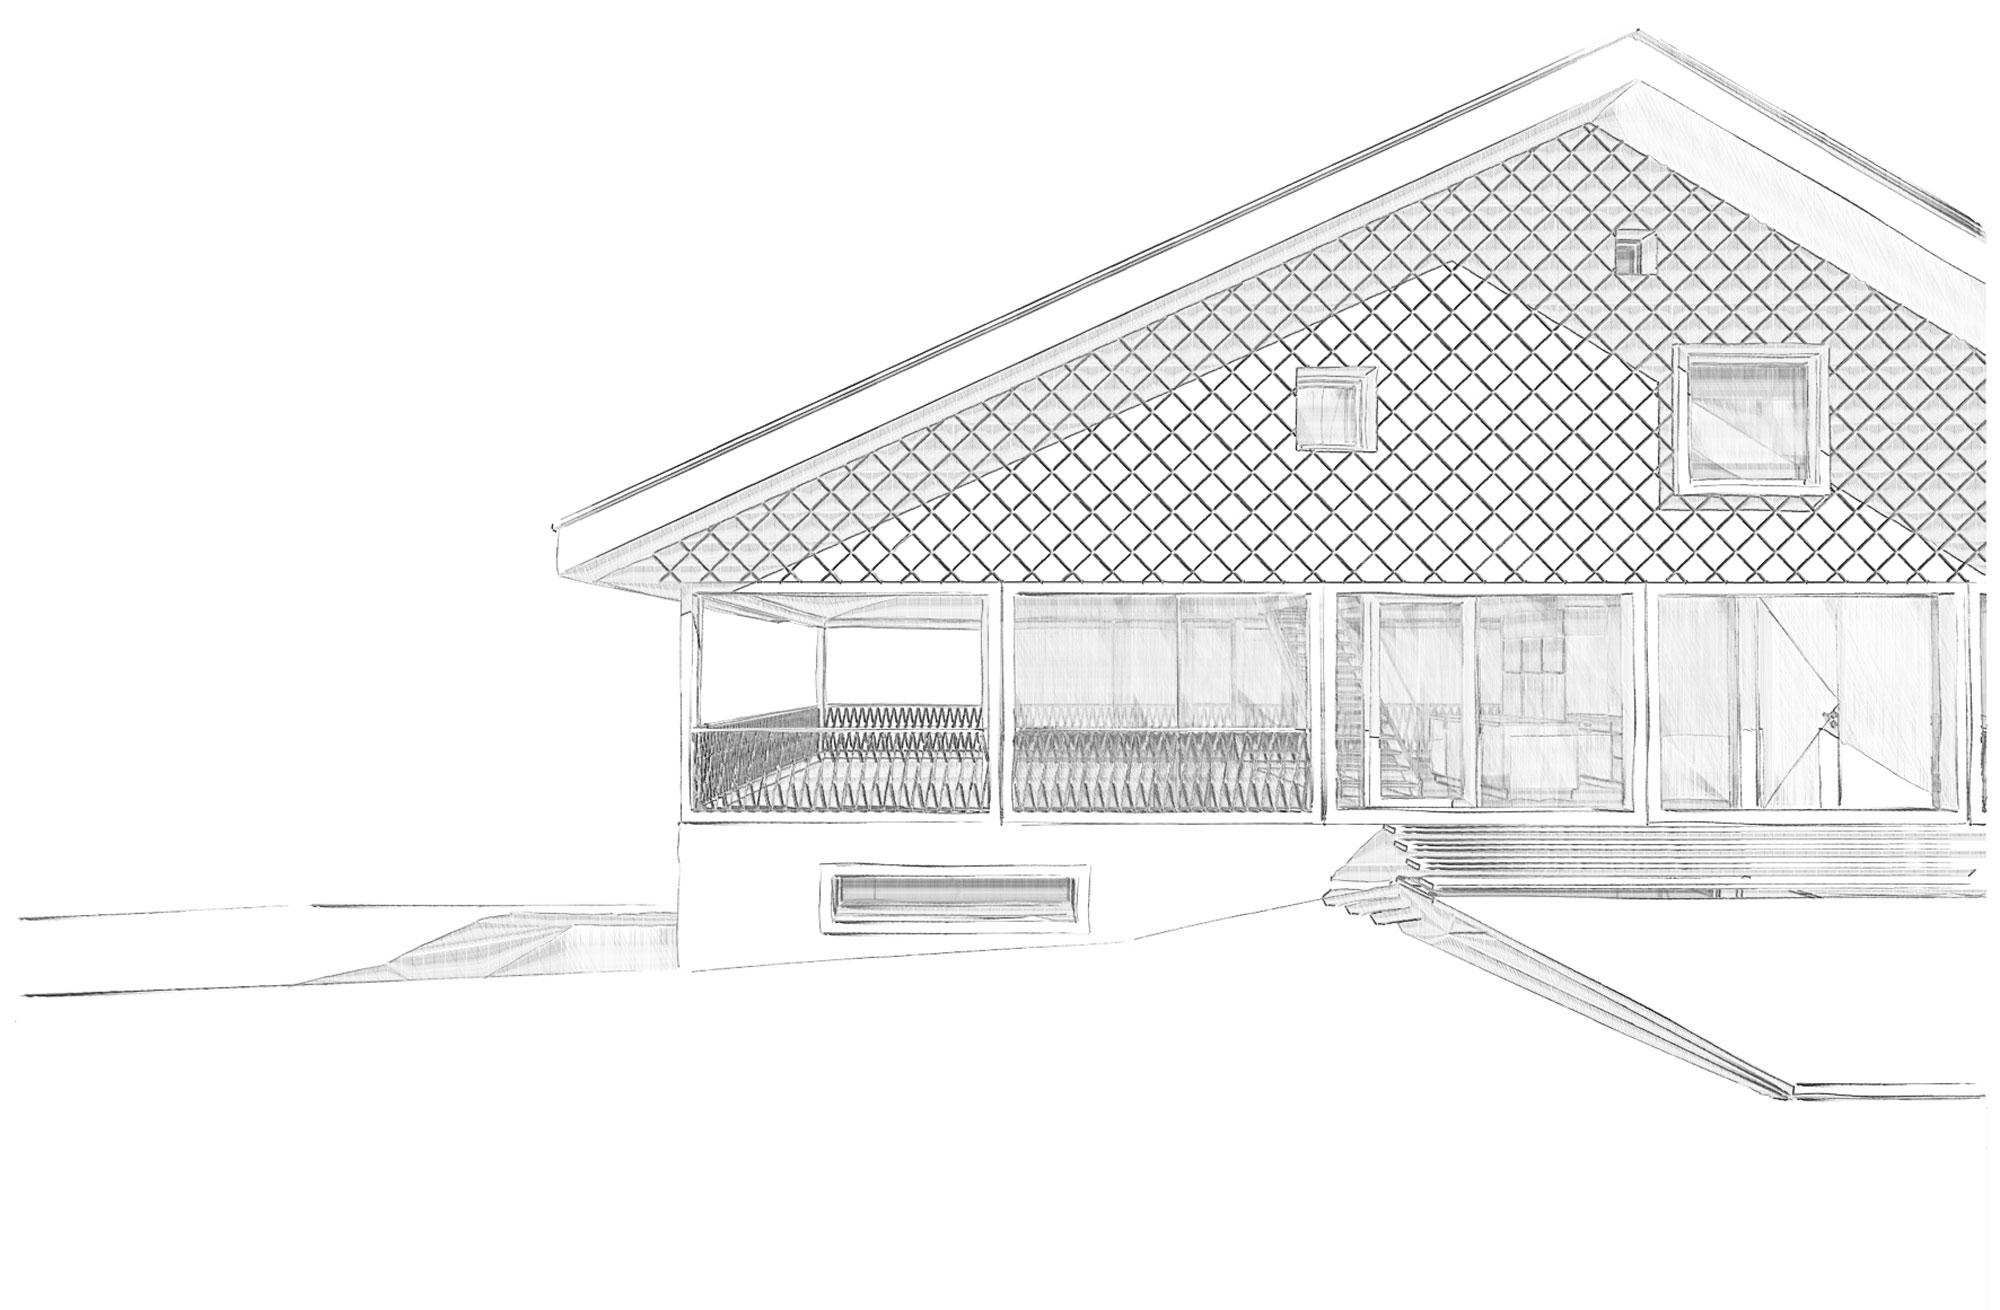 MAA_Murer_Andre_Architektur_Ersatzneubau_Buochs_002.jpg